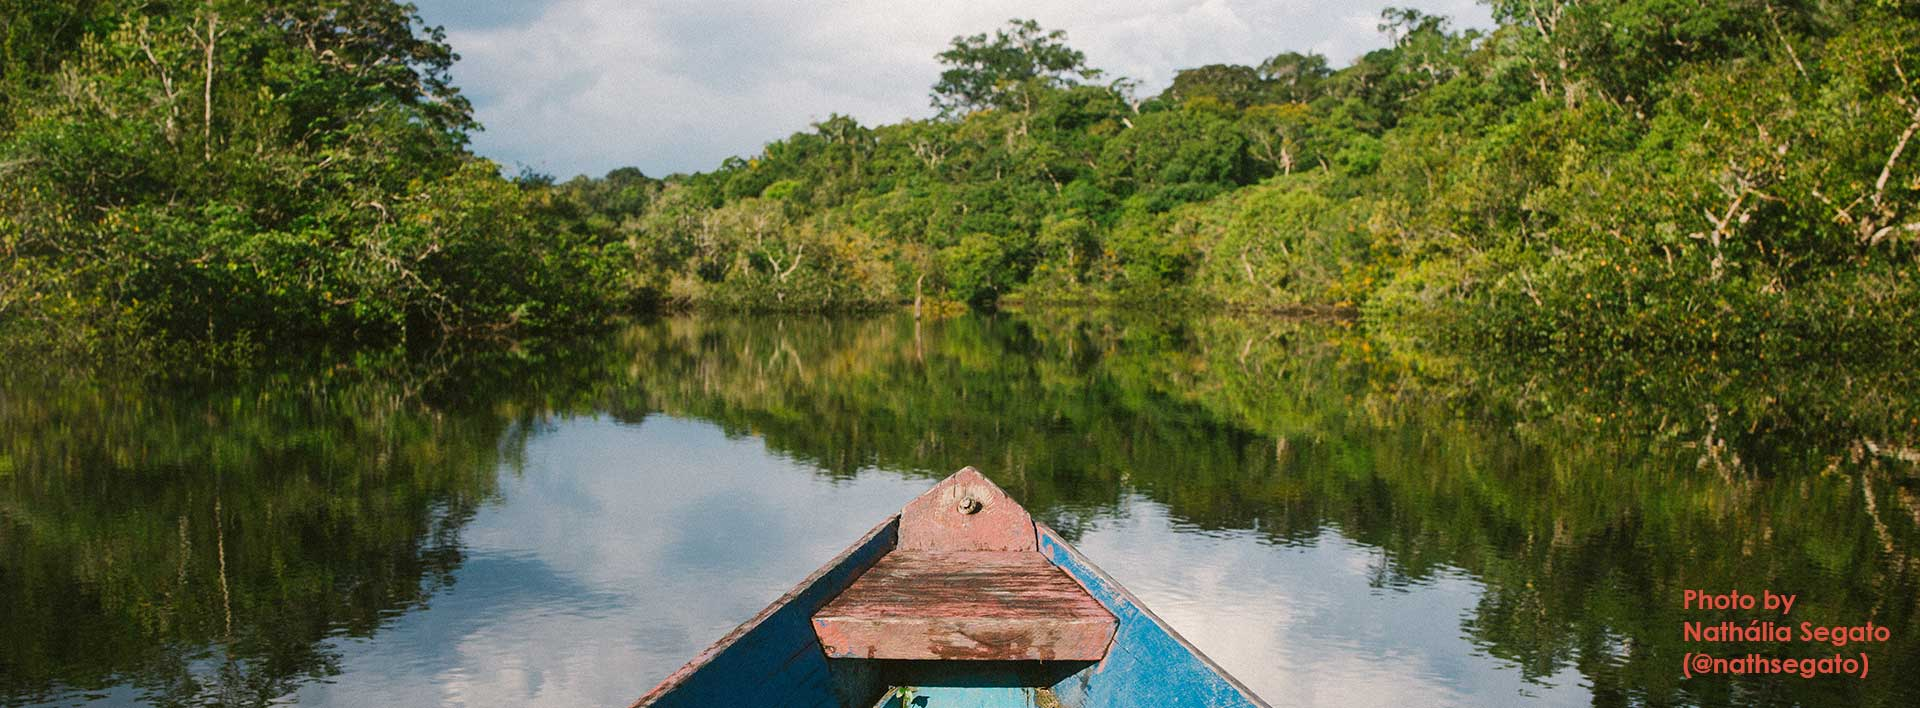 Passa uma tarde numa aldeia indígena amazónica